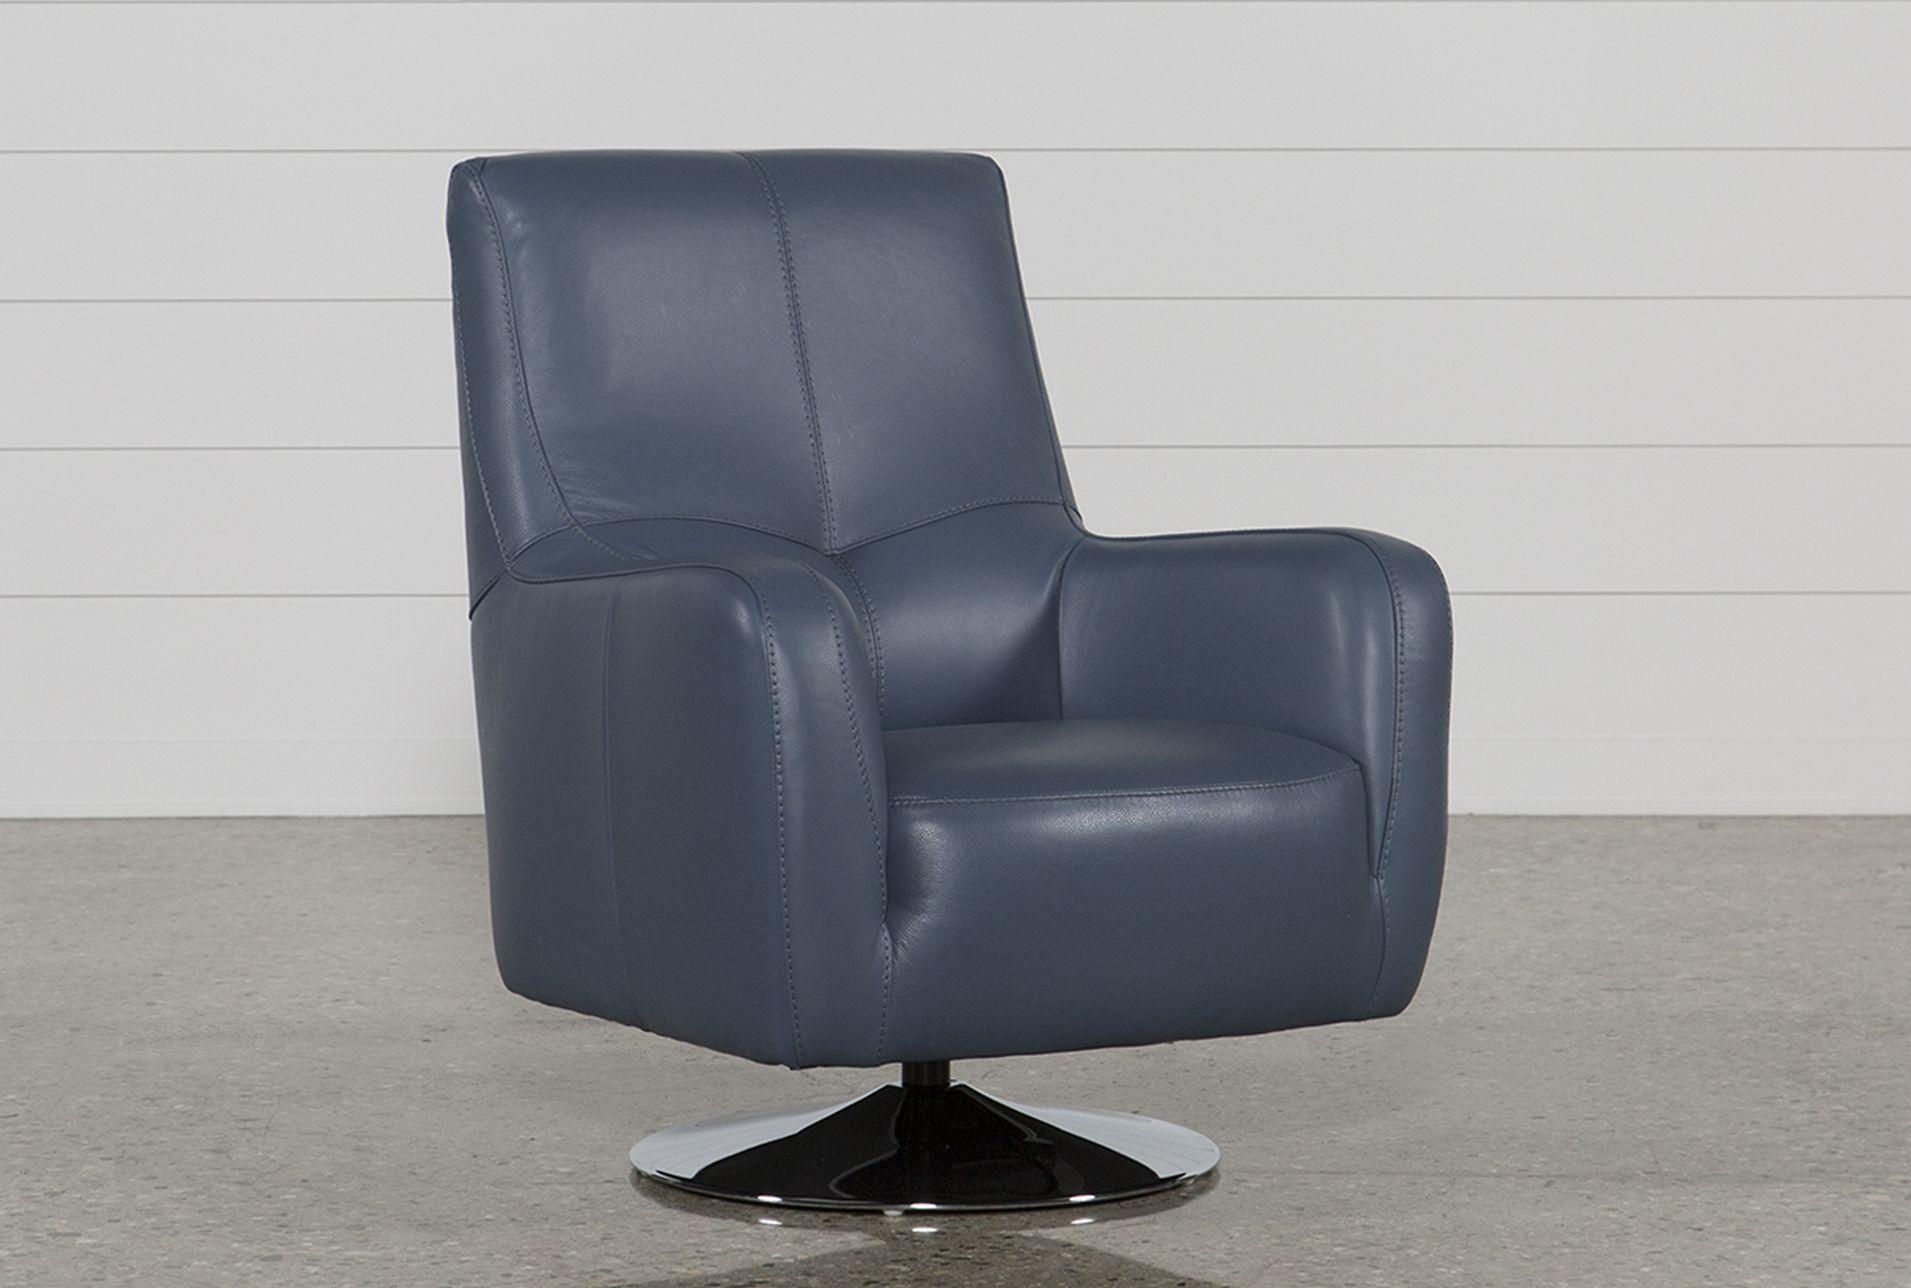 Best Kawai Swivel Chair Blue Leather Swivel Chair White 400 x 300